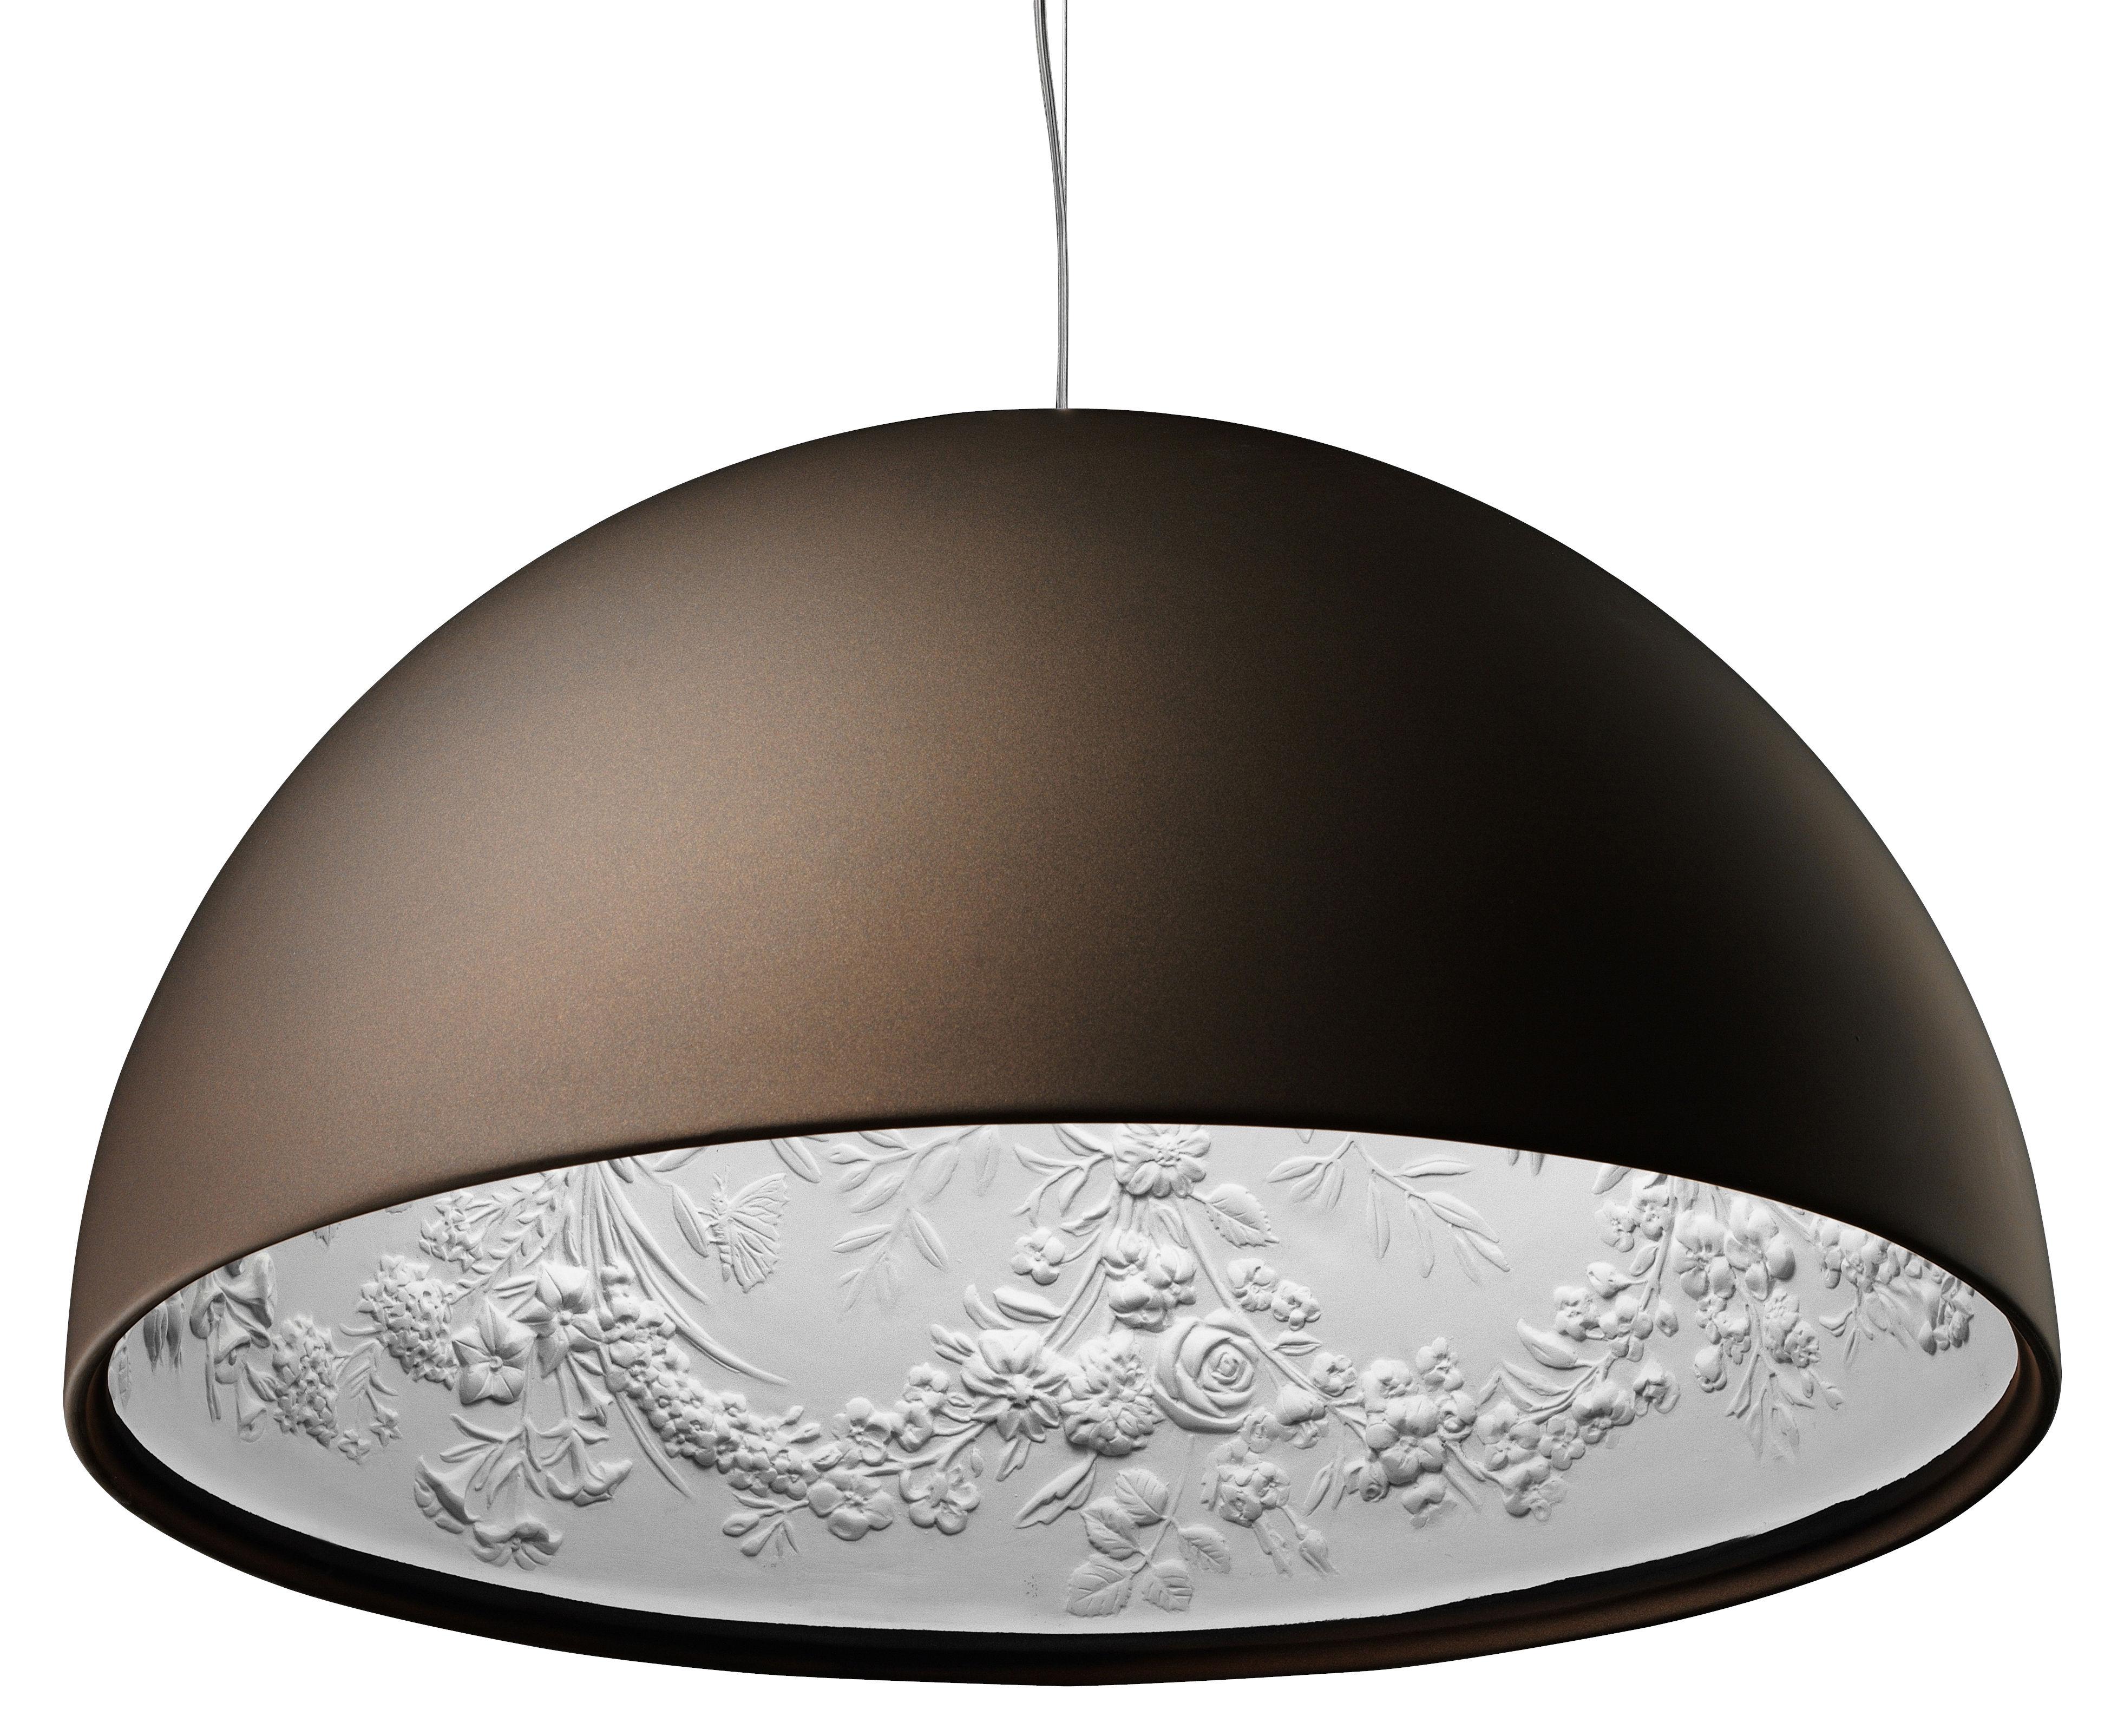 Leuchten - Pendelleuchten - Skygarden 2 Pendelleuchte Ø 90 cm - Flos - Matt bronze - Aluminium, Gips